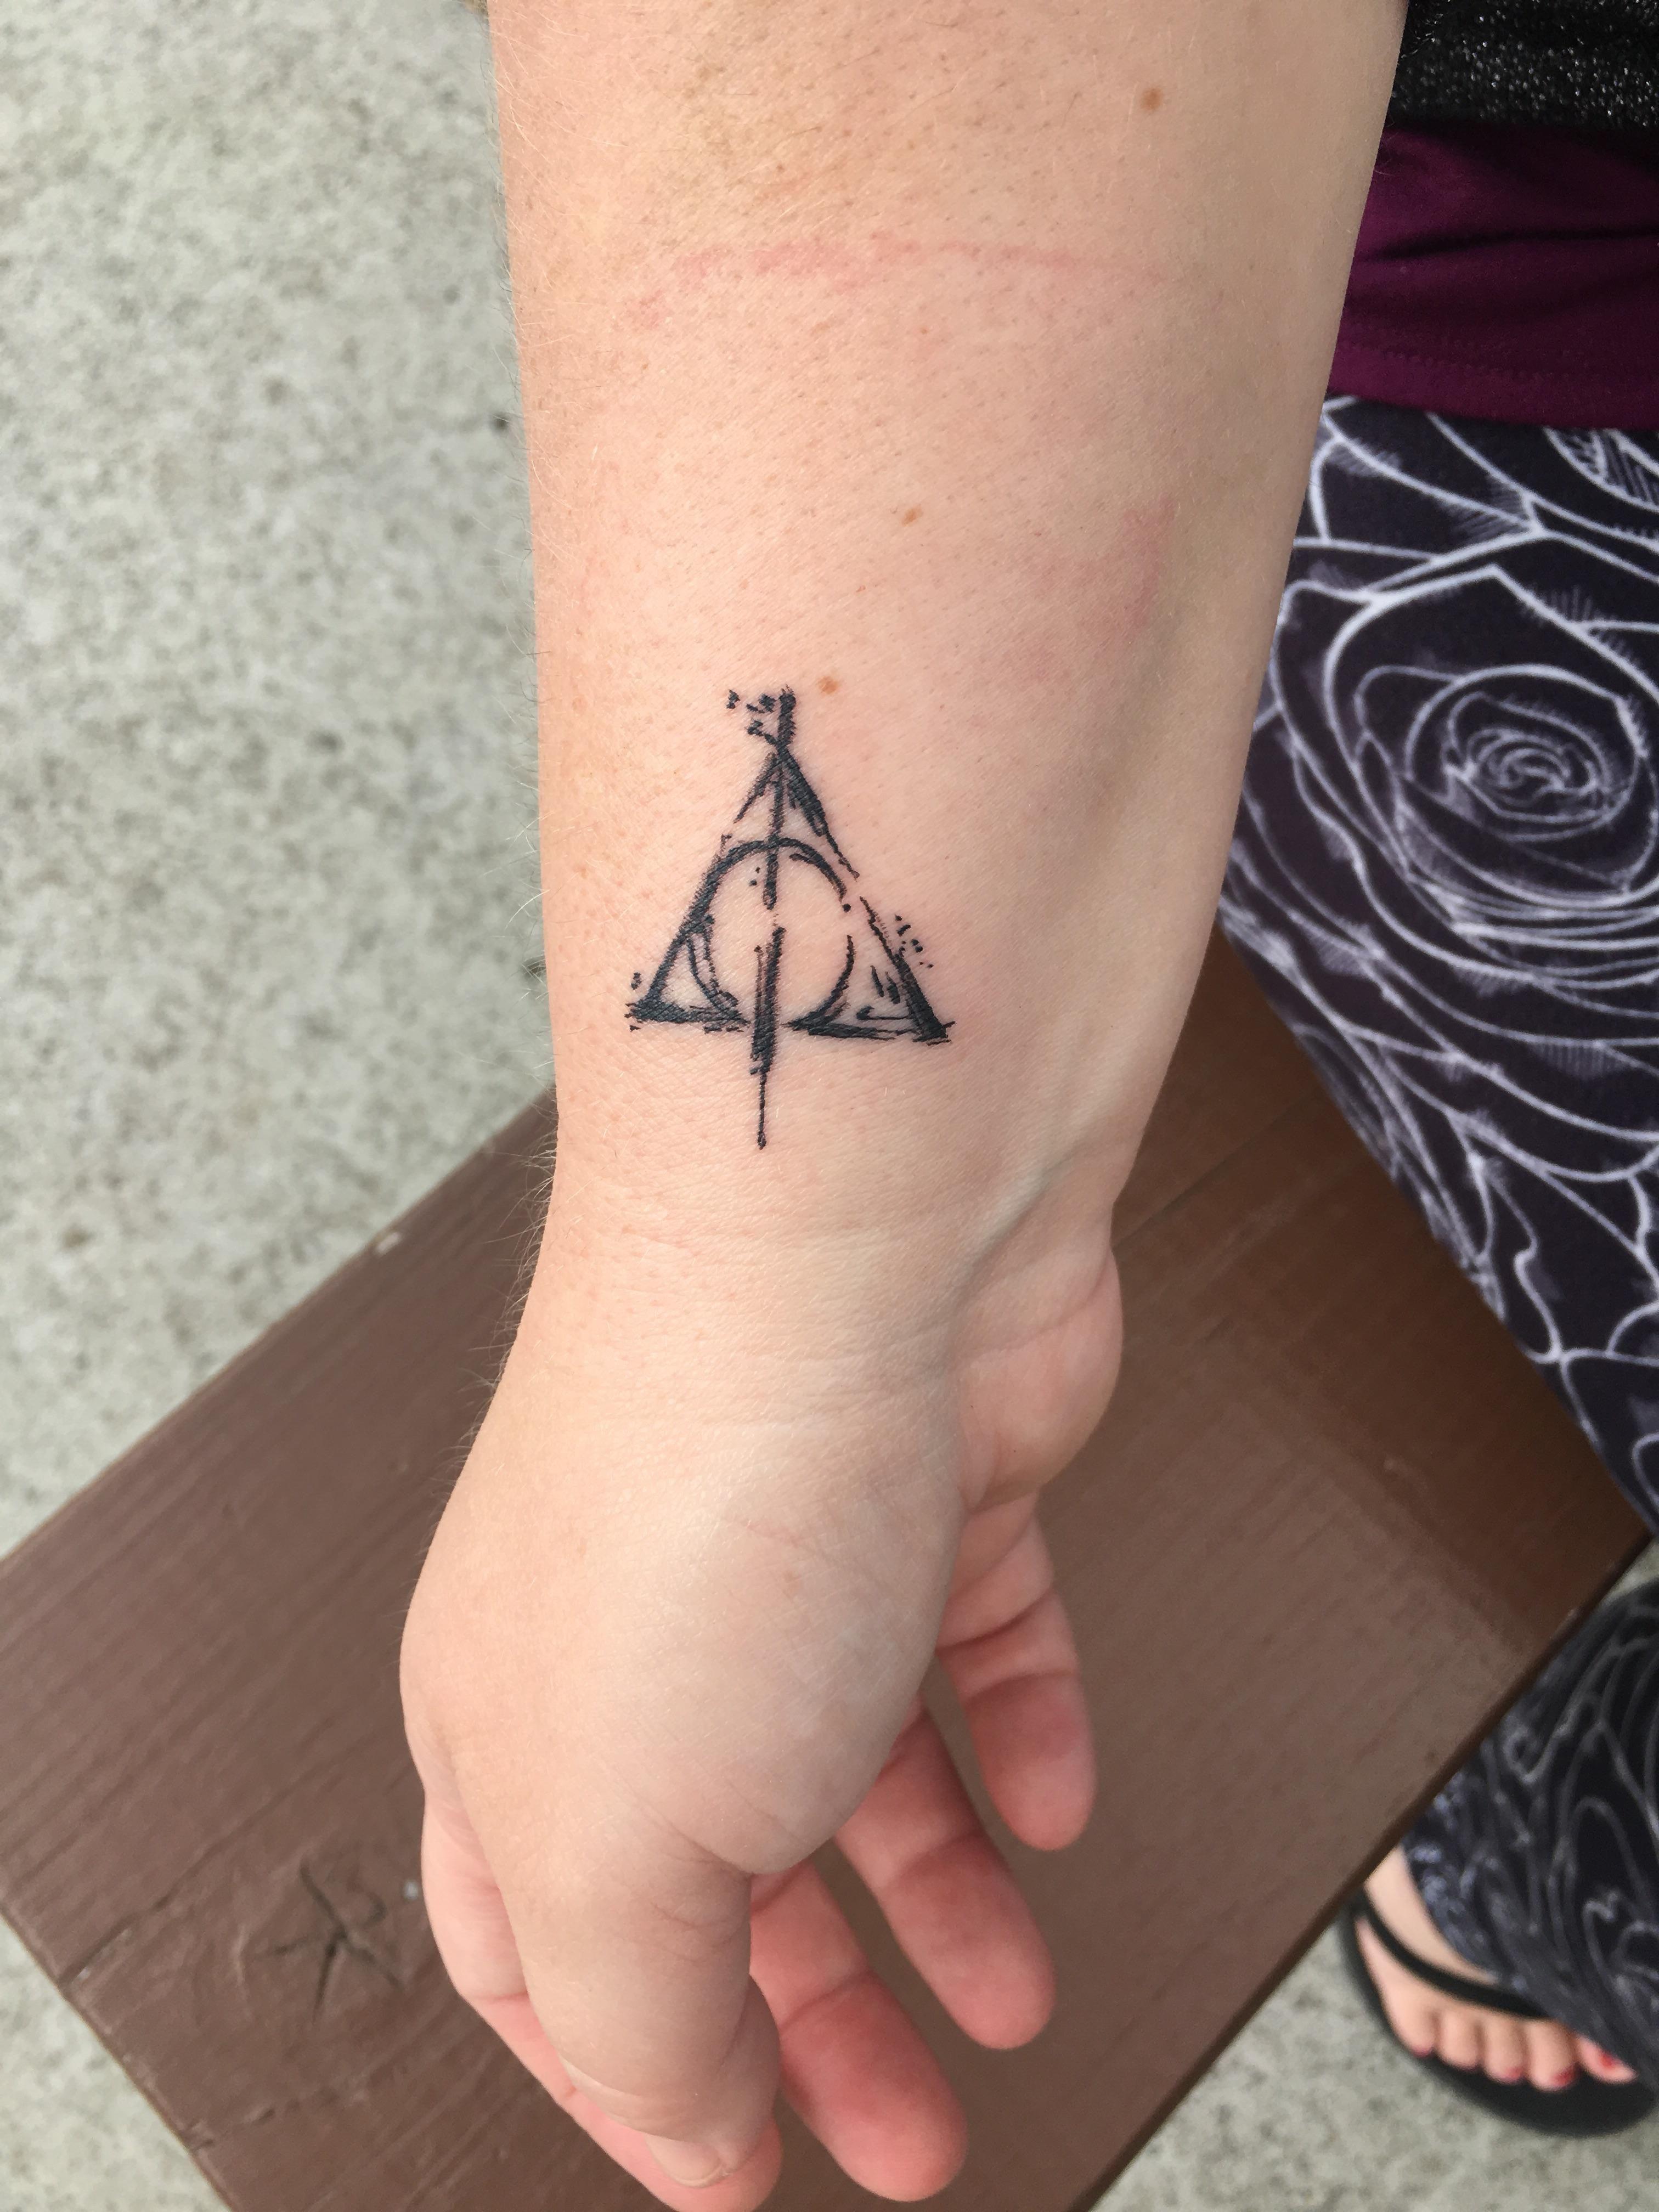 Gothboiclique Search Results Tattoo Lil Peep Tattoos Tattoos